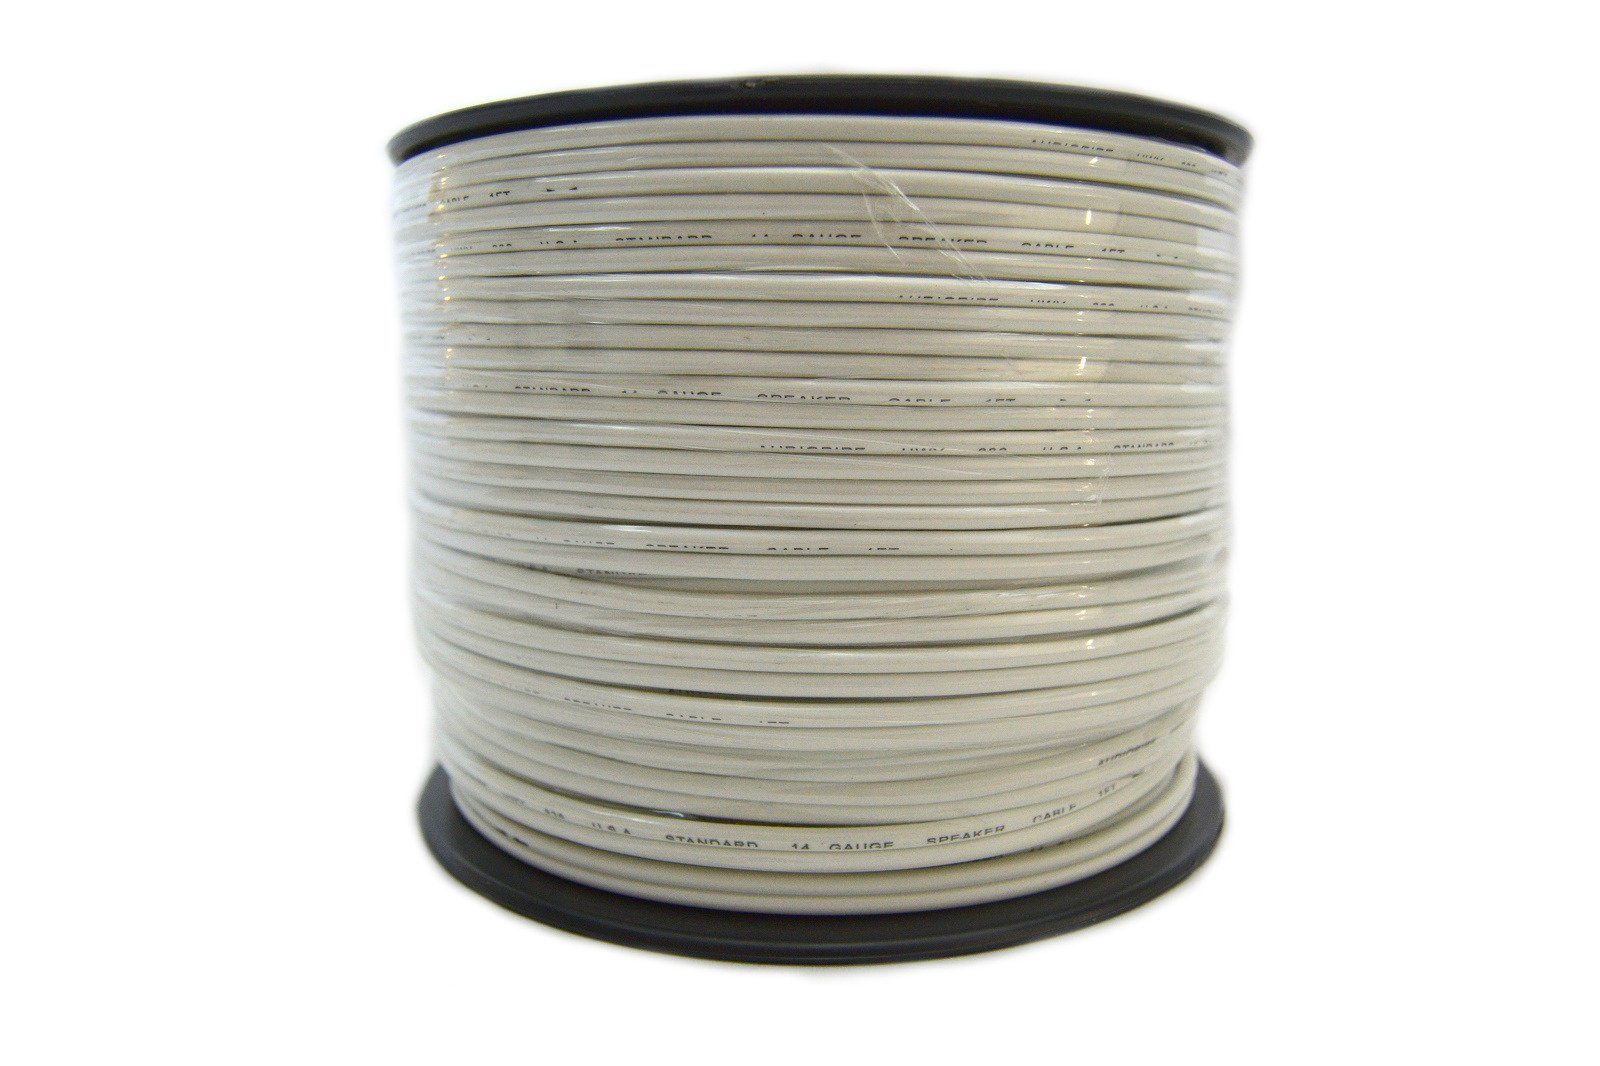 Speaker Wire 14 GA White Stranded Copper Clad 250 Feet Home Audio Surround Sound